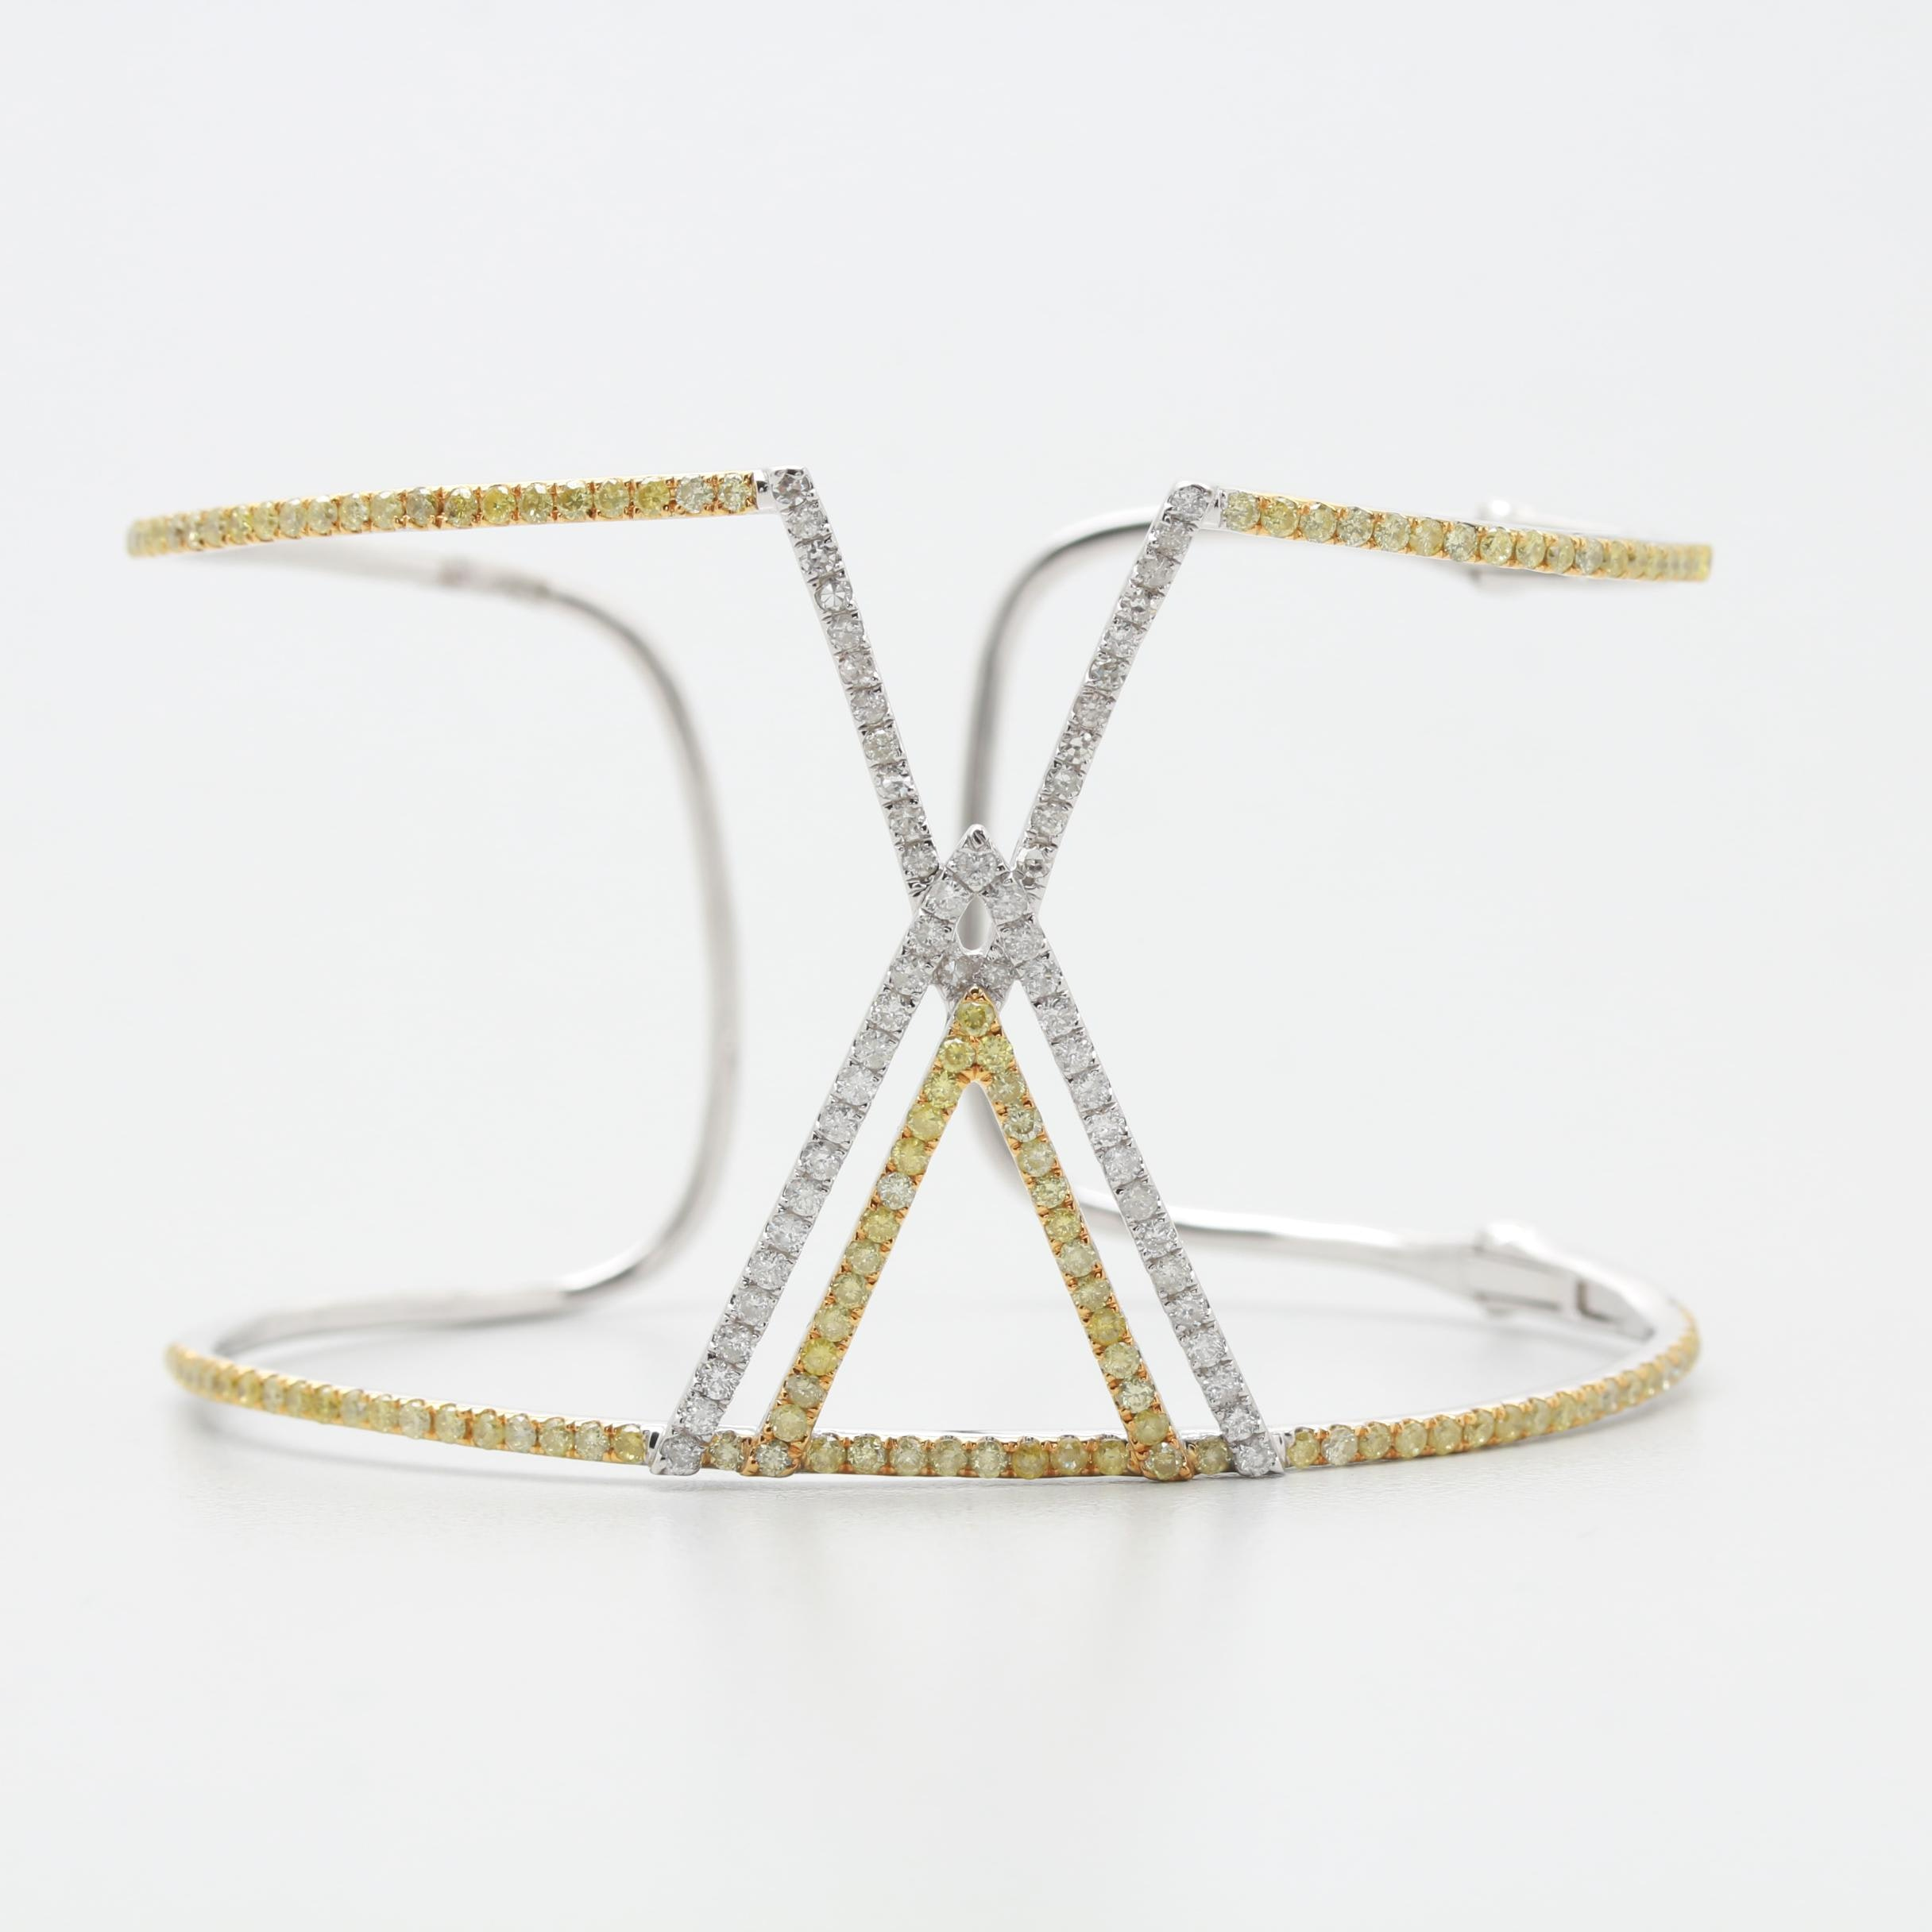 14K White Gold 1.79 CTW Diamond Openwork Cuff Bracelet